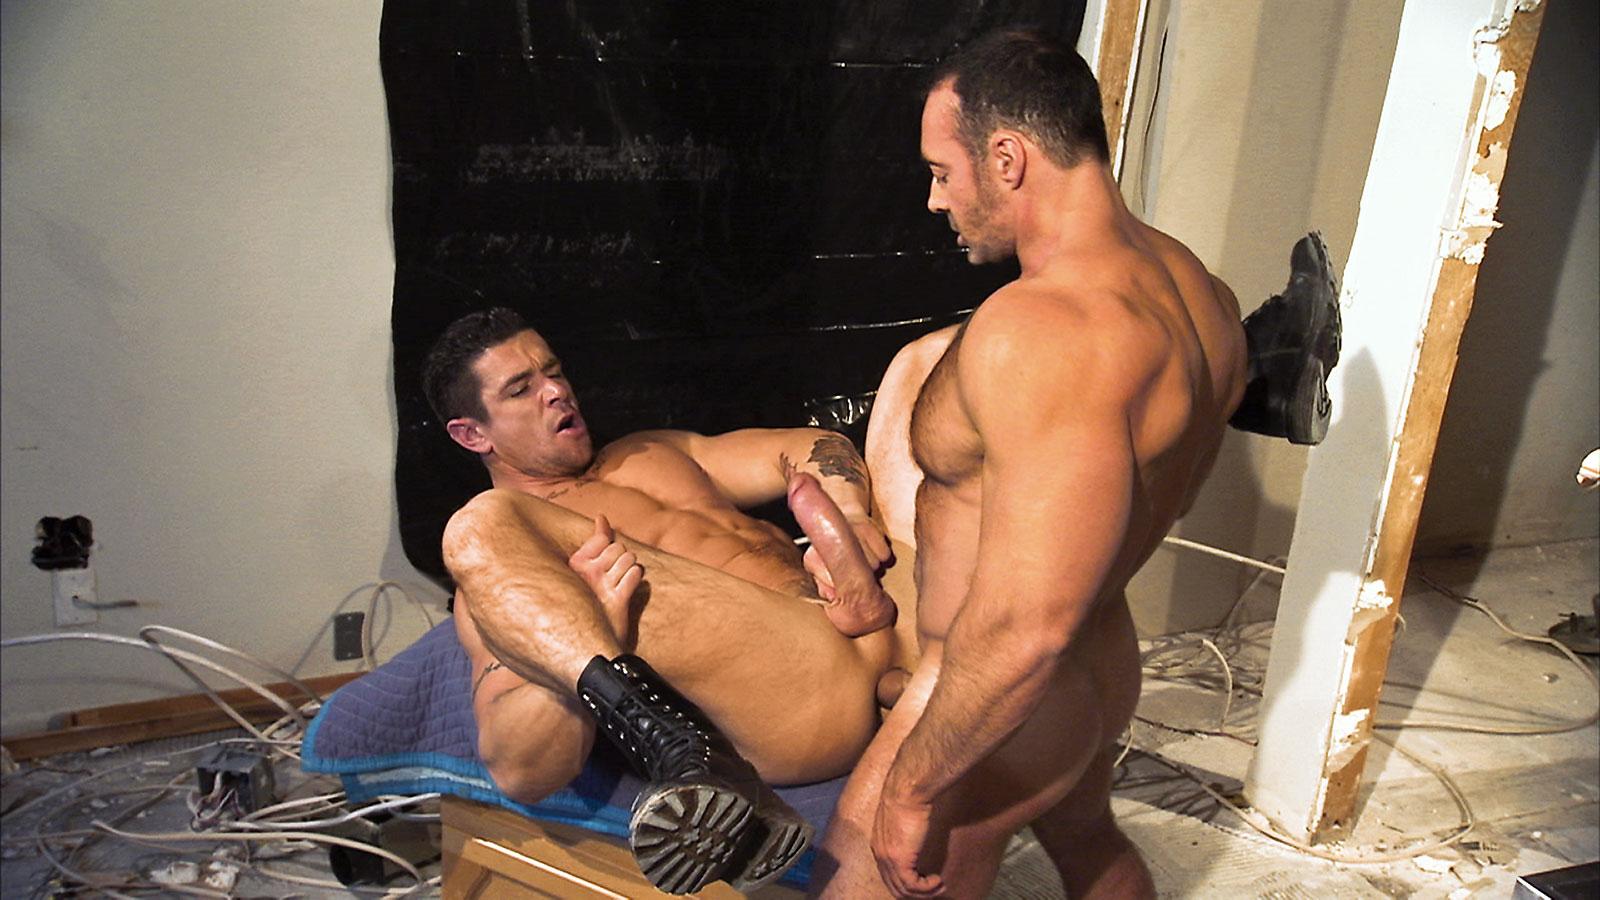 gay sex in steaming room